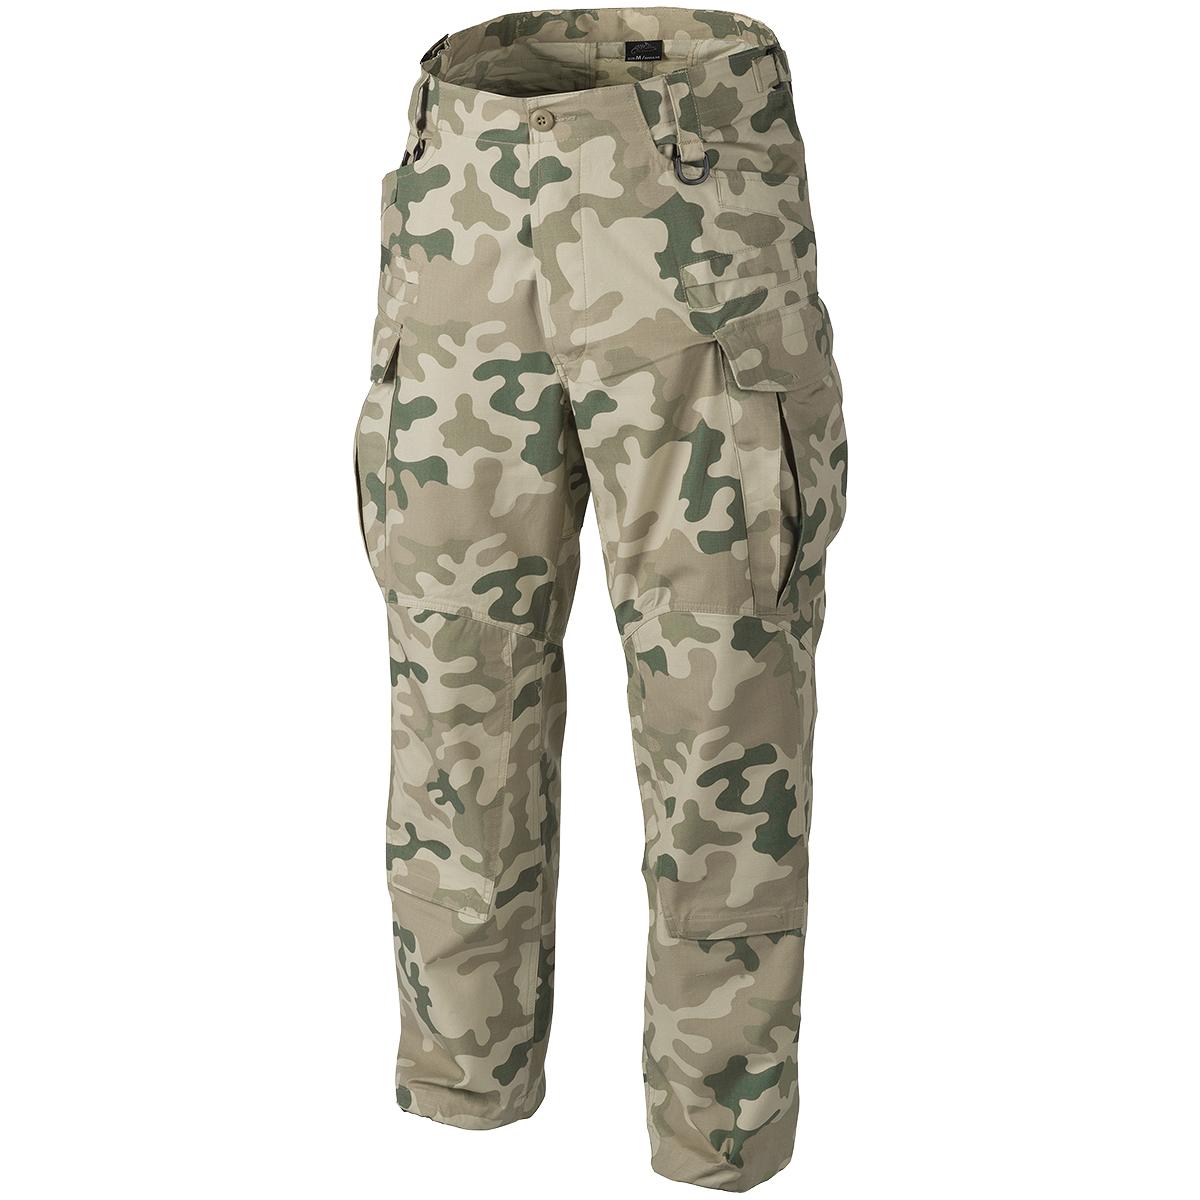 Helikon-SFU-Next-Army-Combat-Trousers-Mens-Hunting-Ripstop-Pants-PL-Desert-Camo